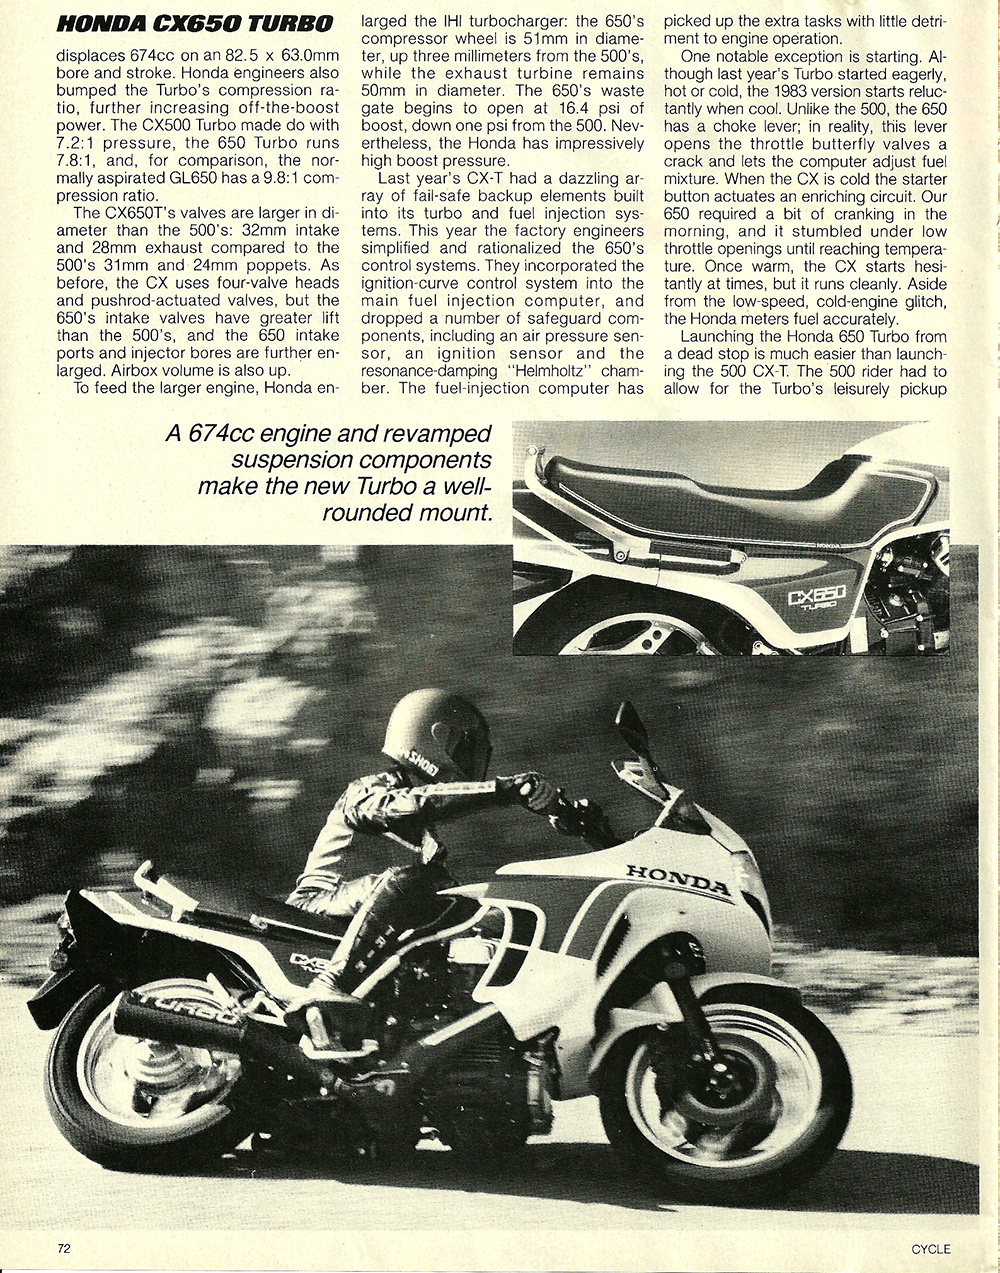 1983 Honda CX650 turbo road test 3.jpg